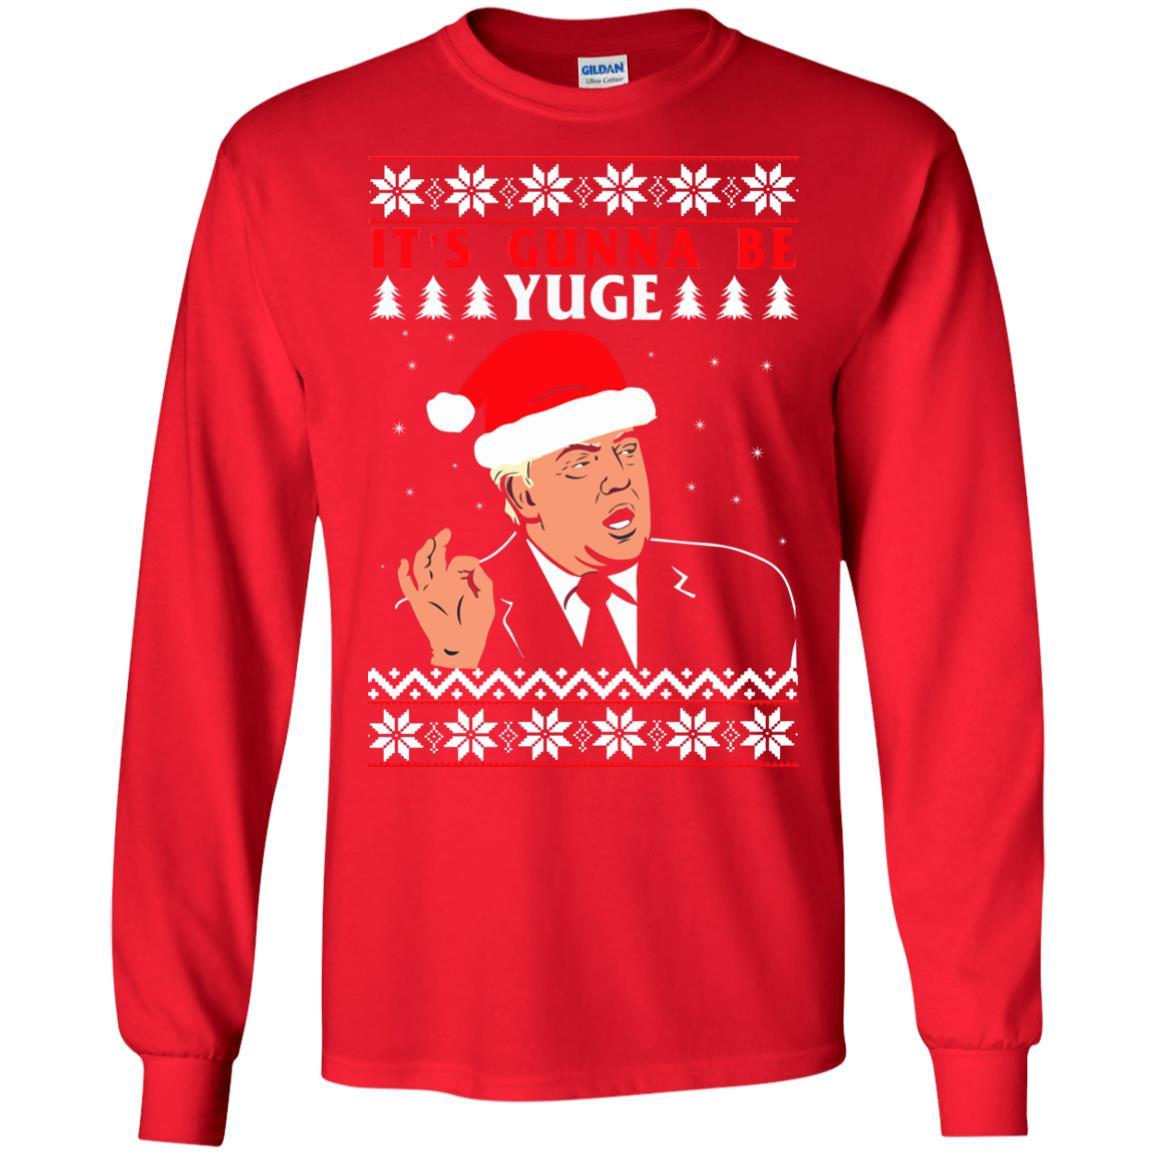 image 1013 - Donald Trump: It's Gunna Be Yuge Christmas Sweater, Hoodie